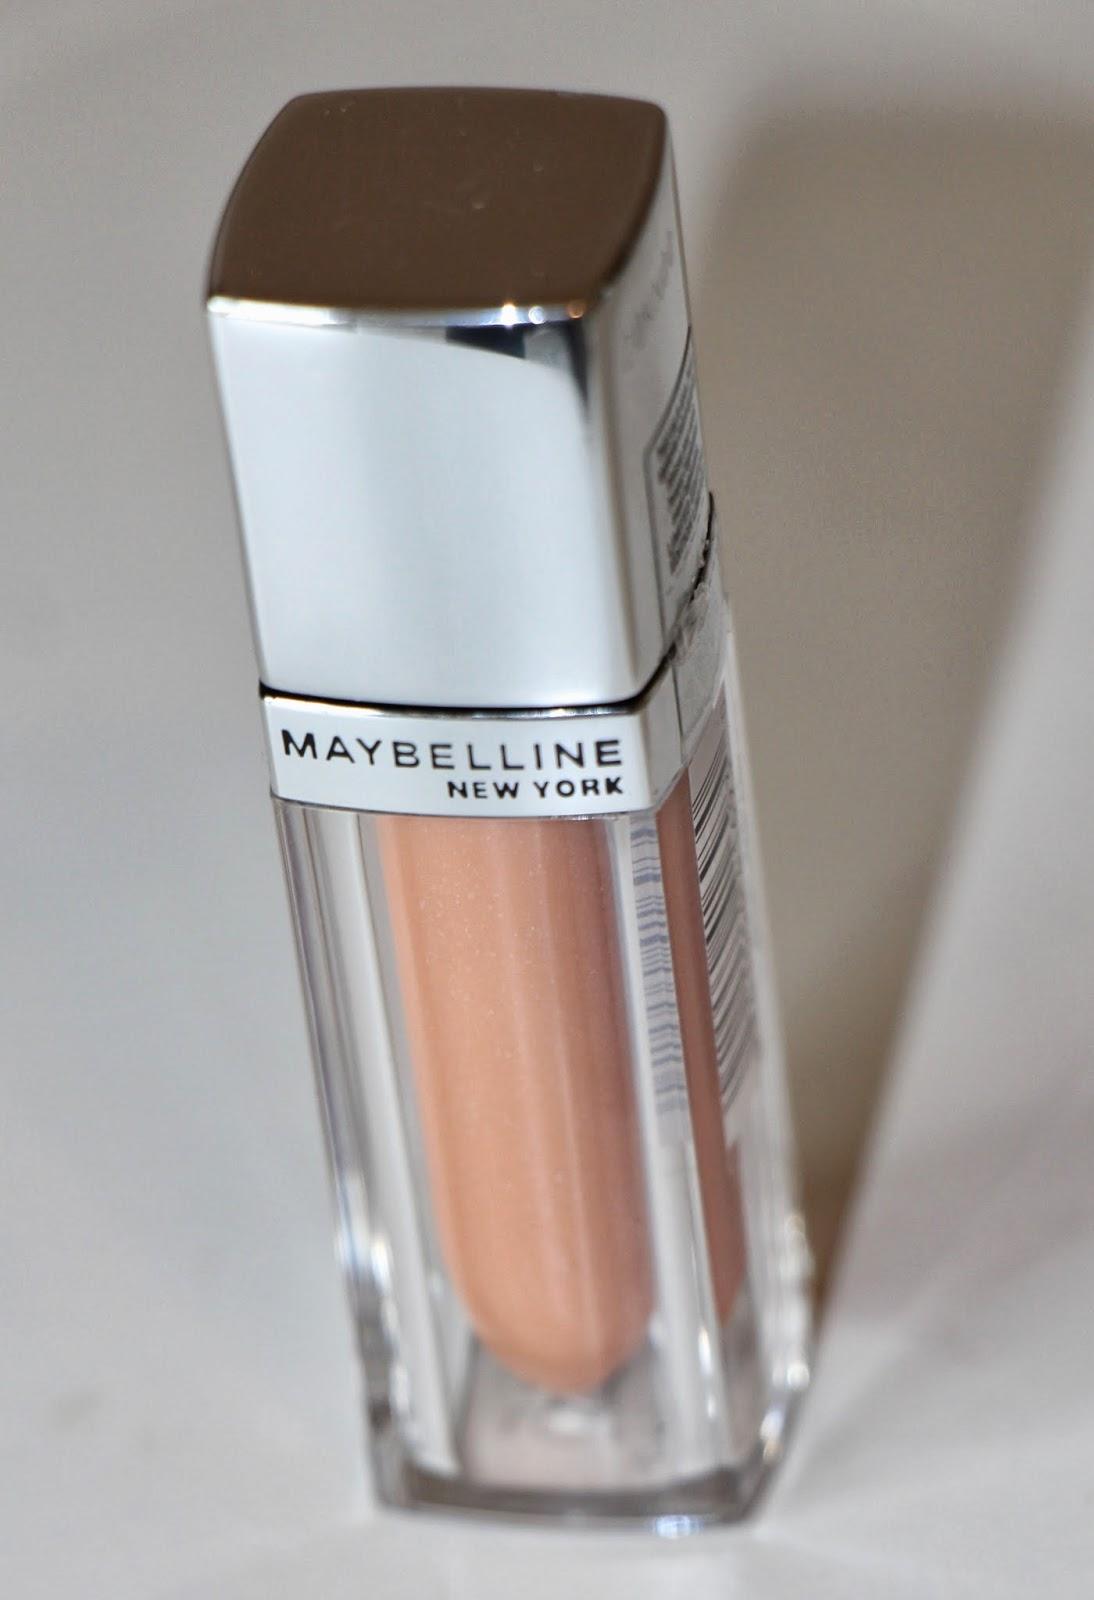 Maybelline Dare to Go Nude Spring 2014 Colorsensational